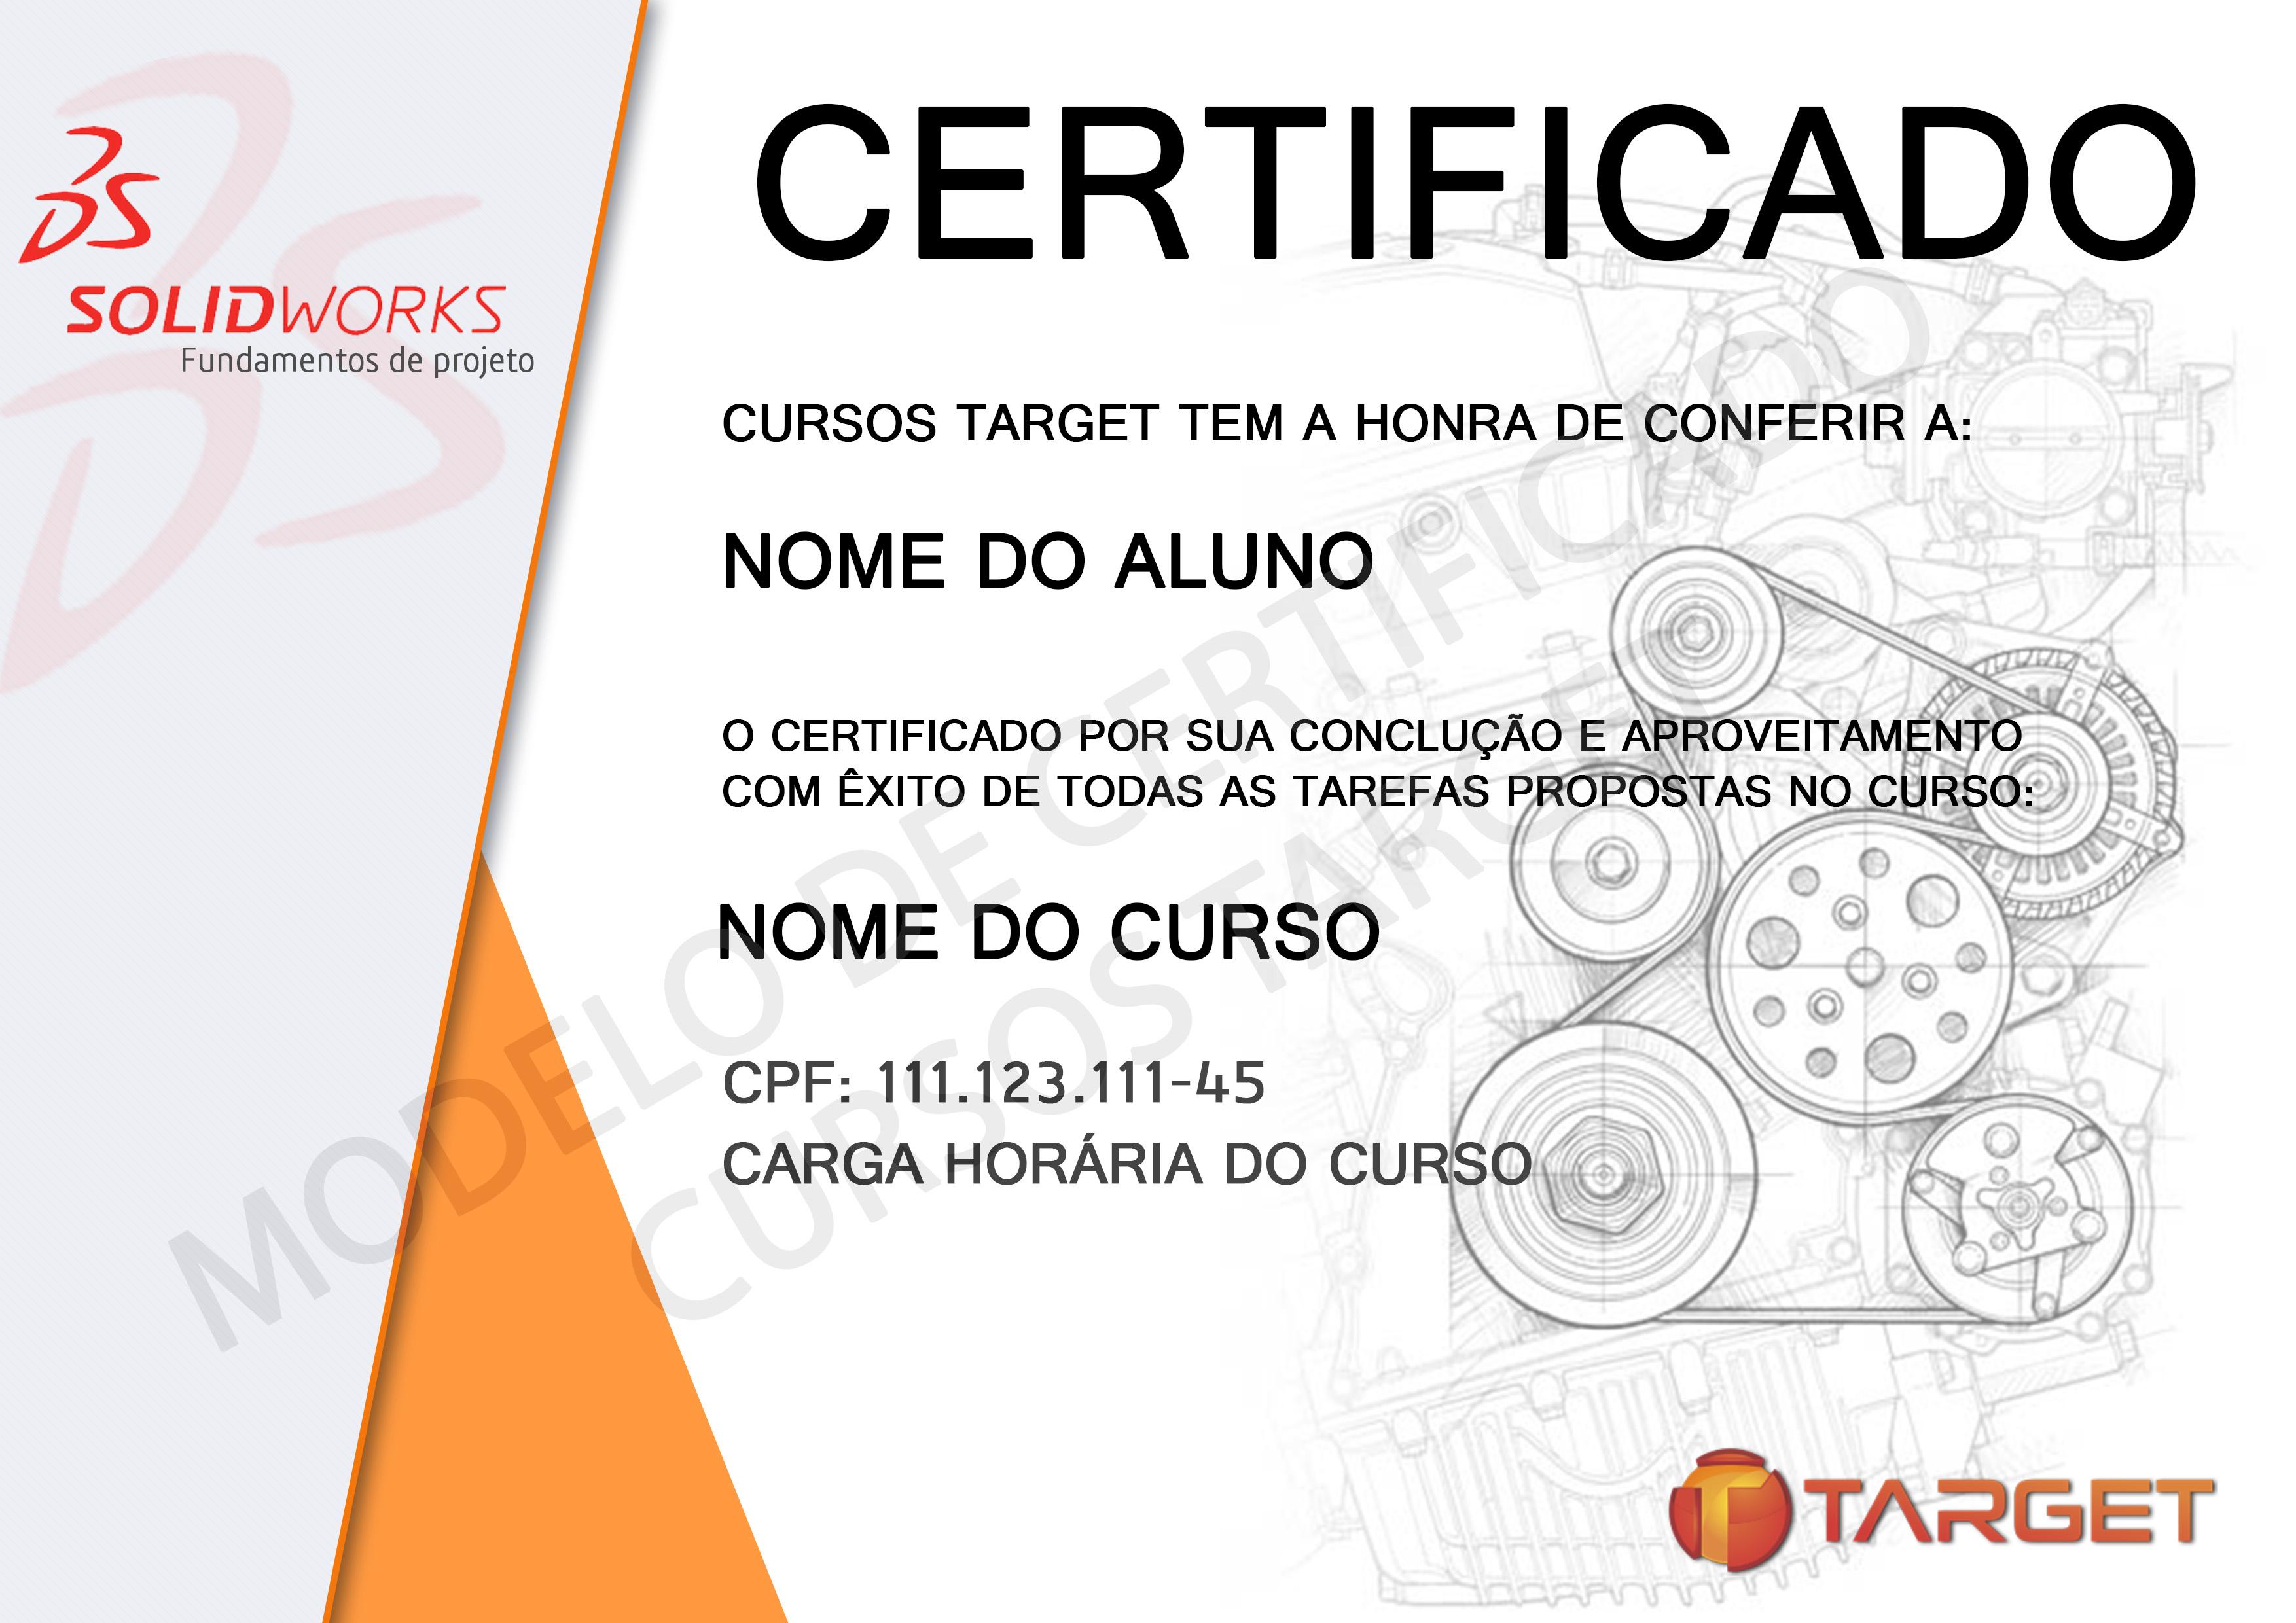 Certificado do Curso